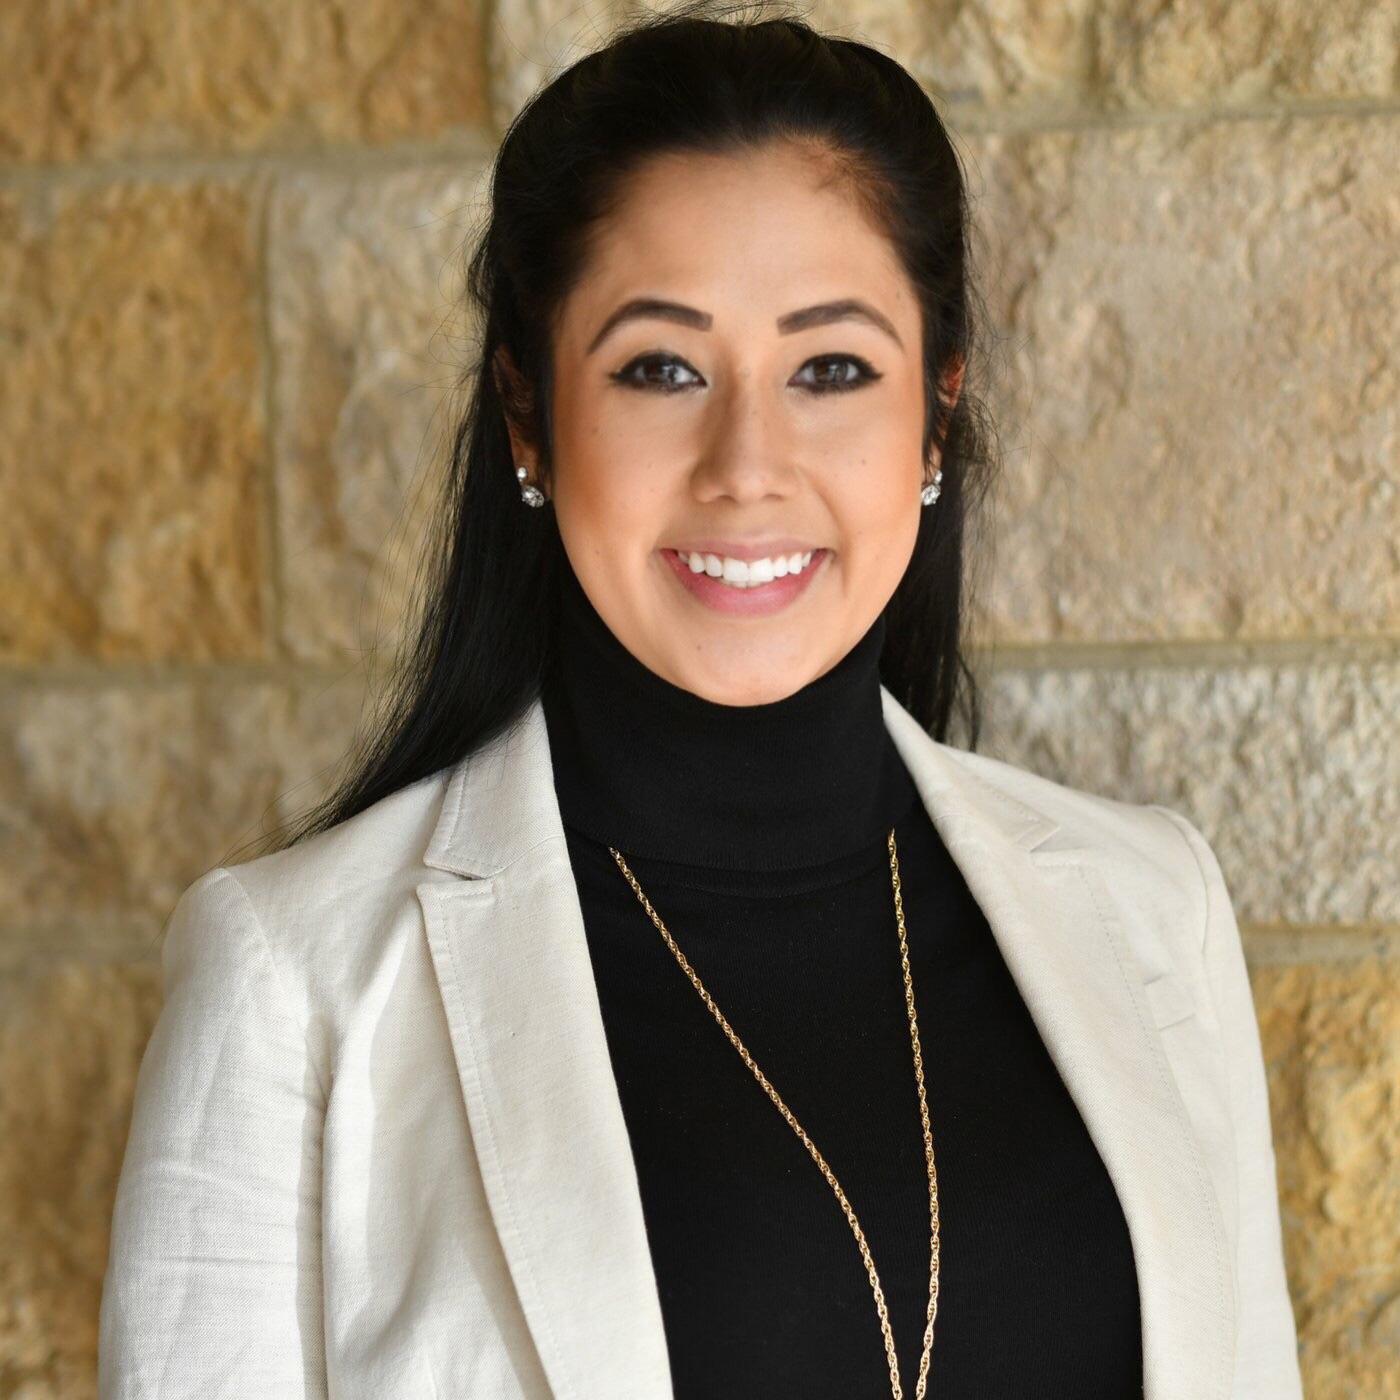 Valeria Martinez2020 Alumna matched at Avivar Capital Current role: Fall VC Intern at Harlem Capital